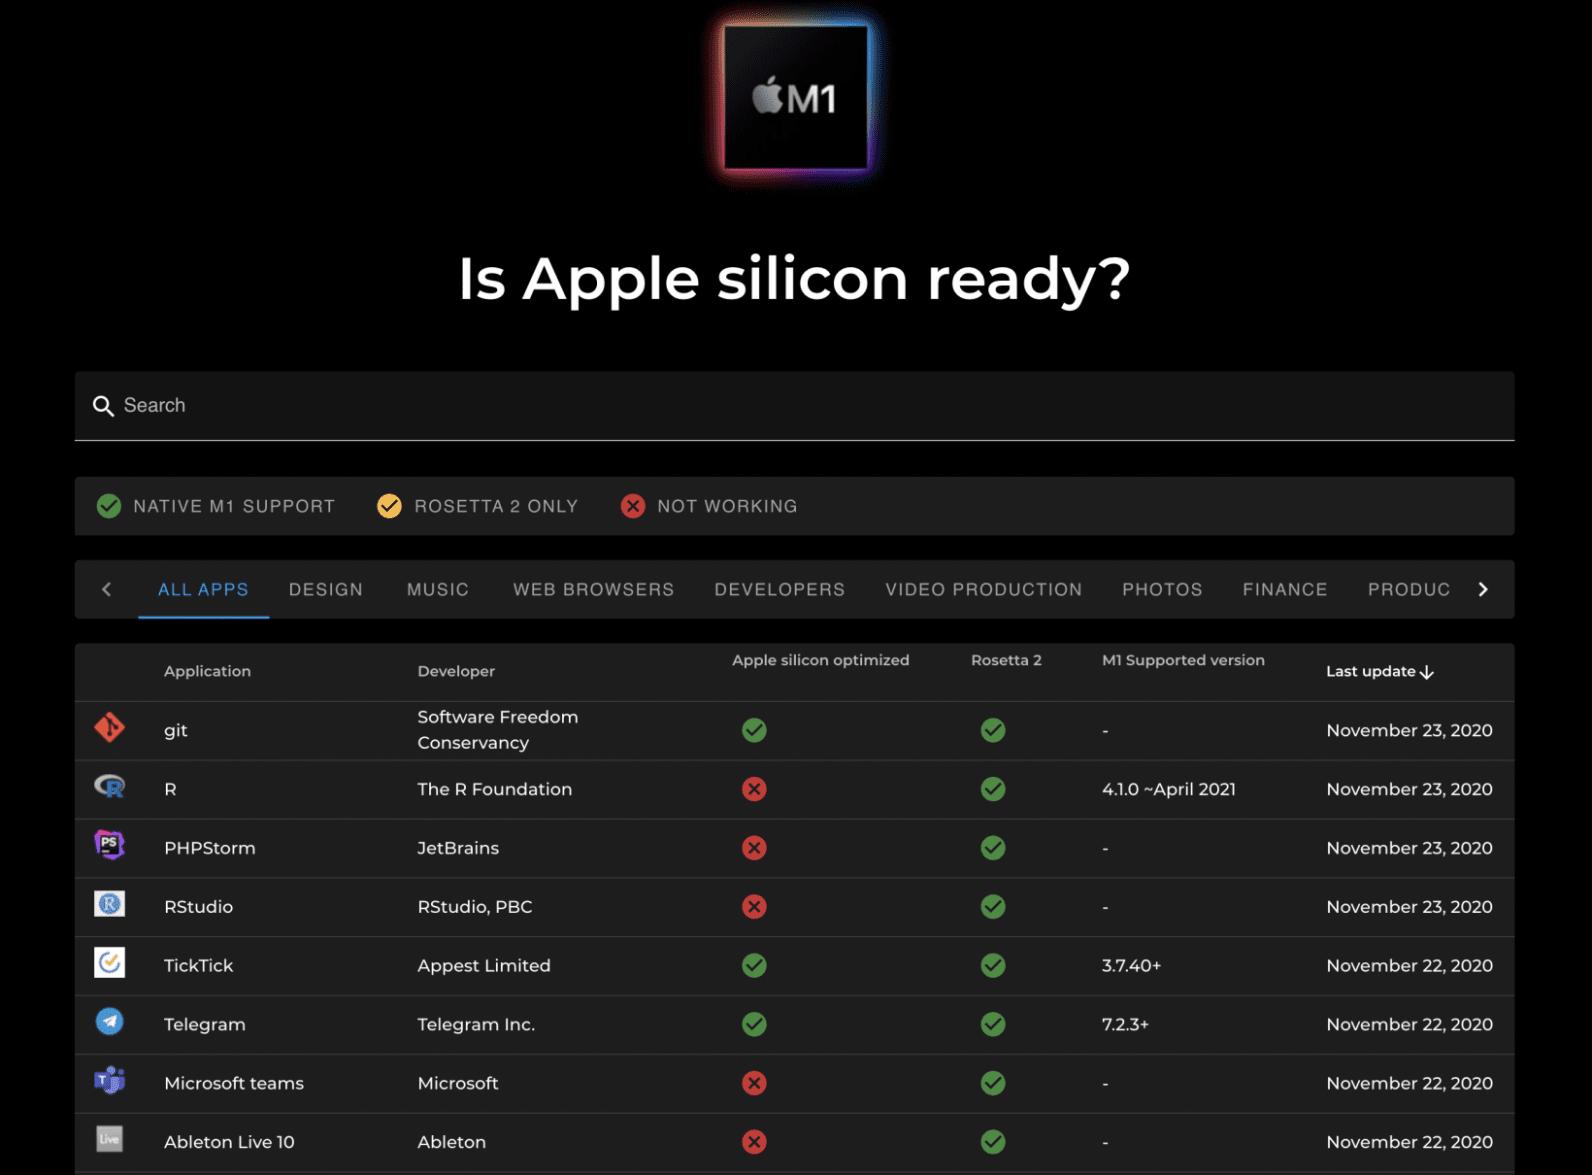 Apple M1 Ableton Live